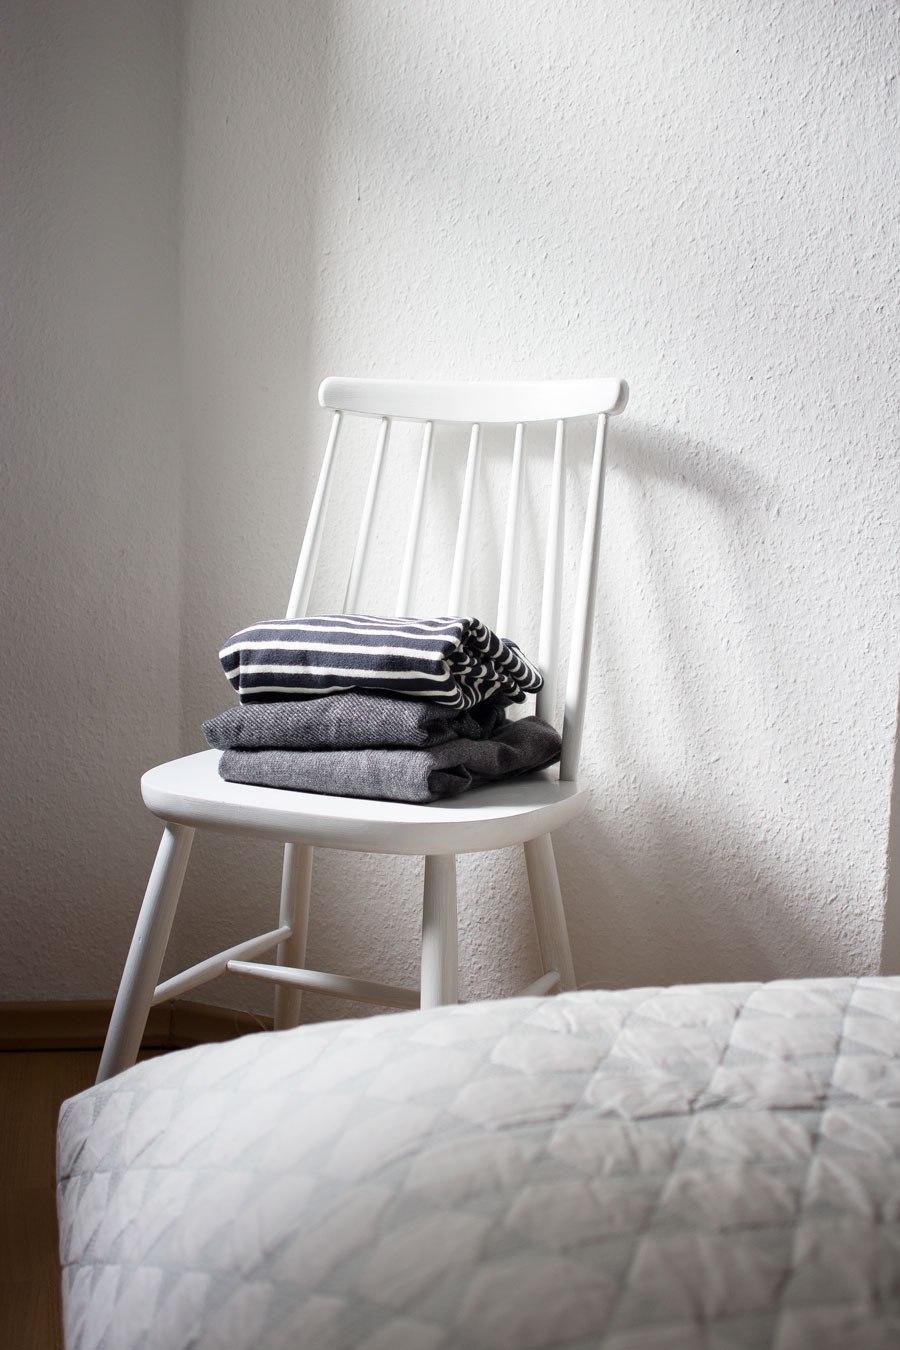 Стул вместо прикроватного столика